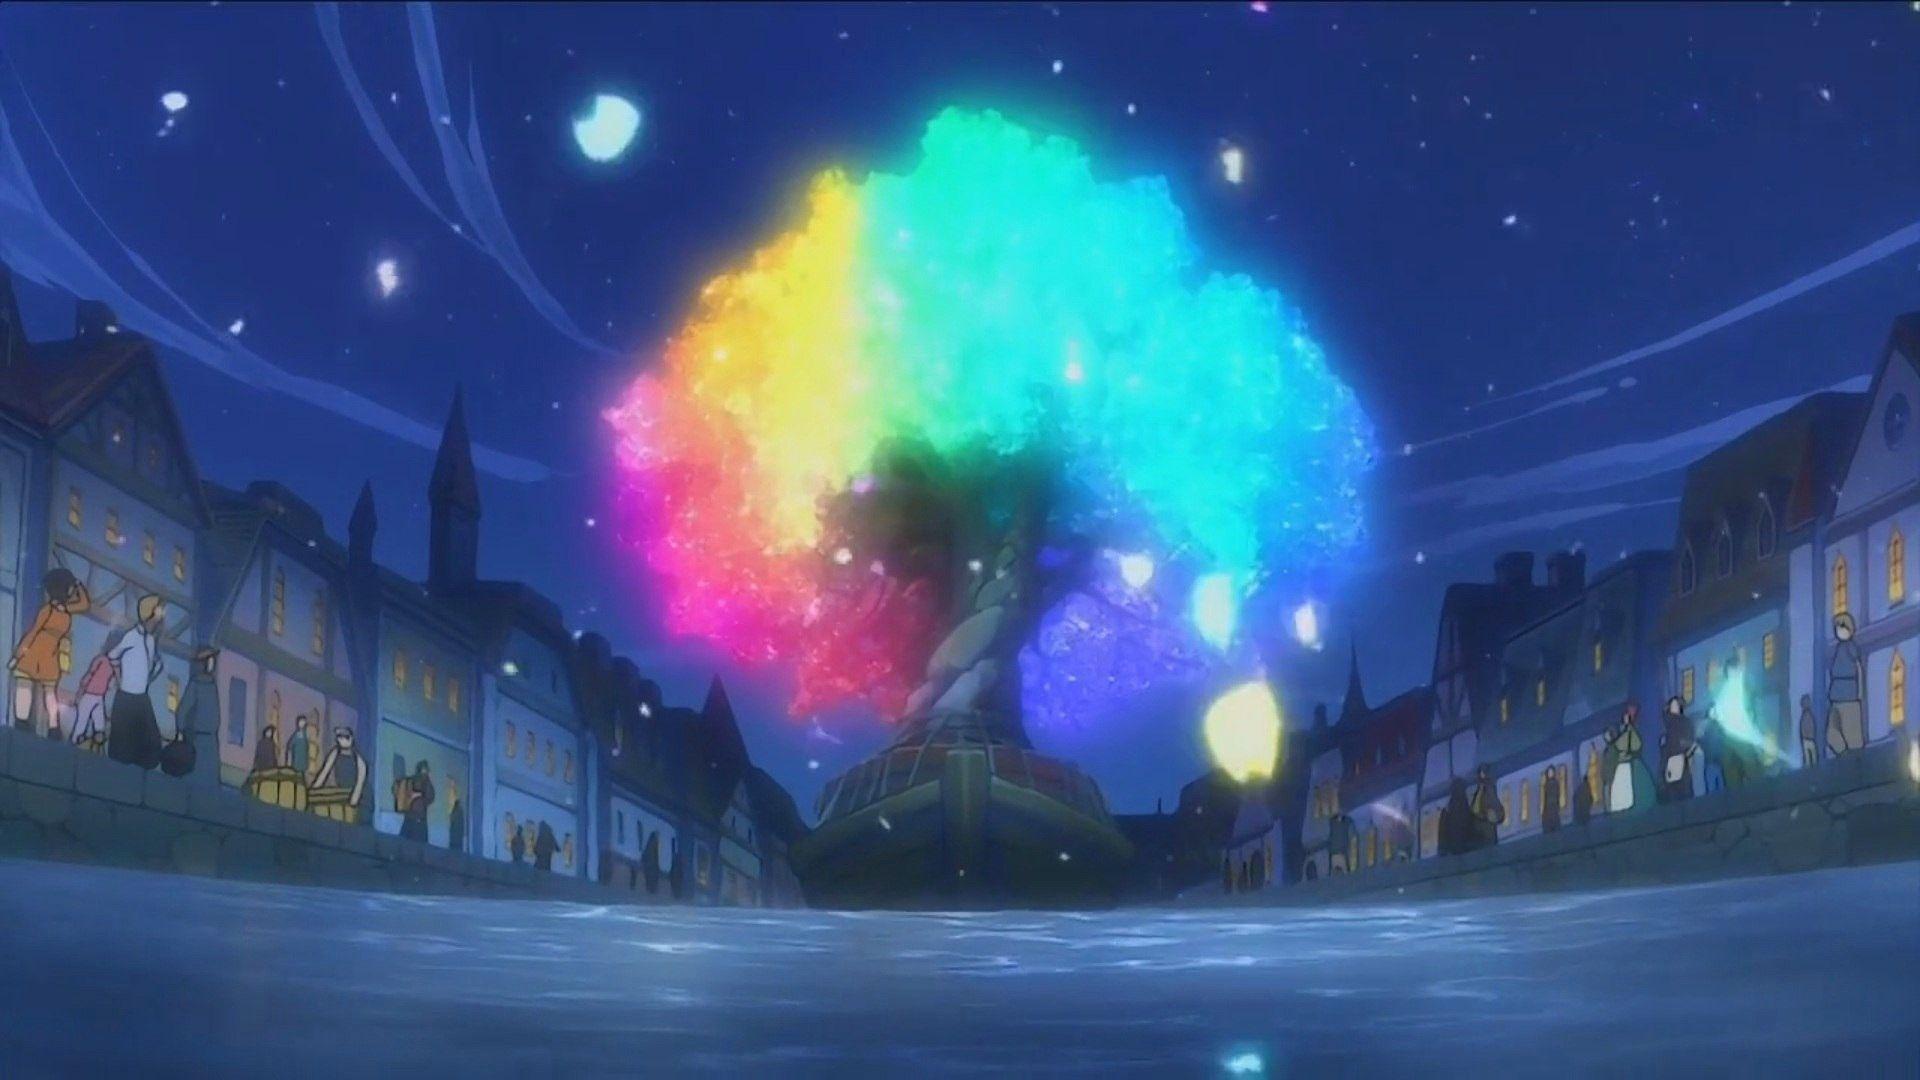 dark anime scenery